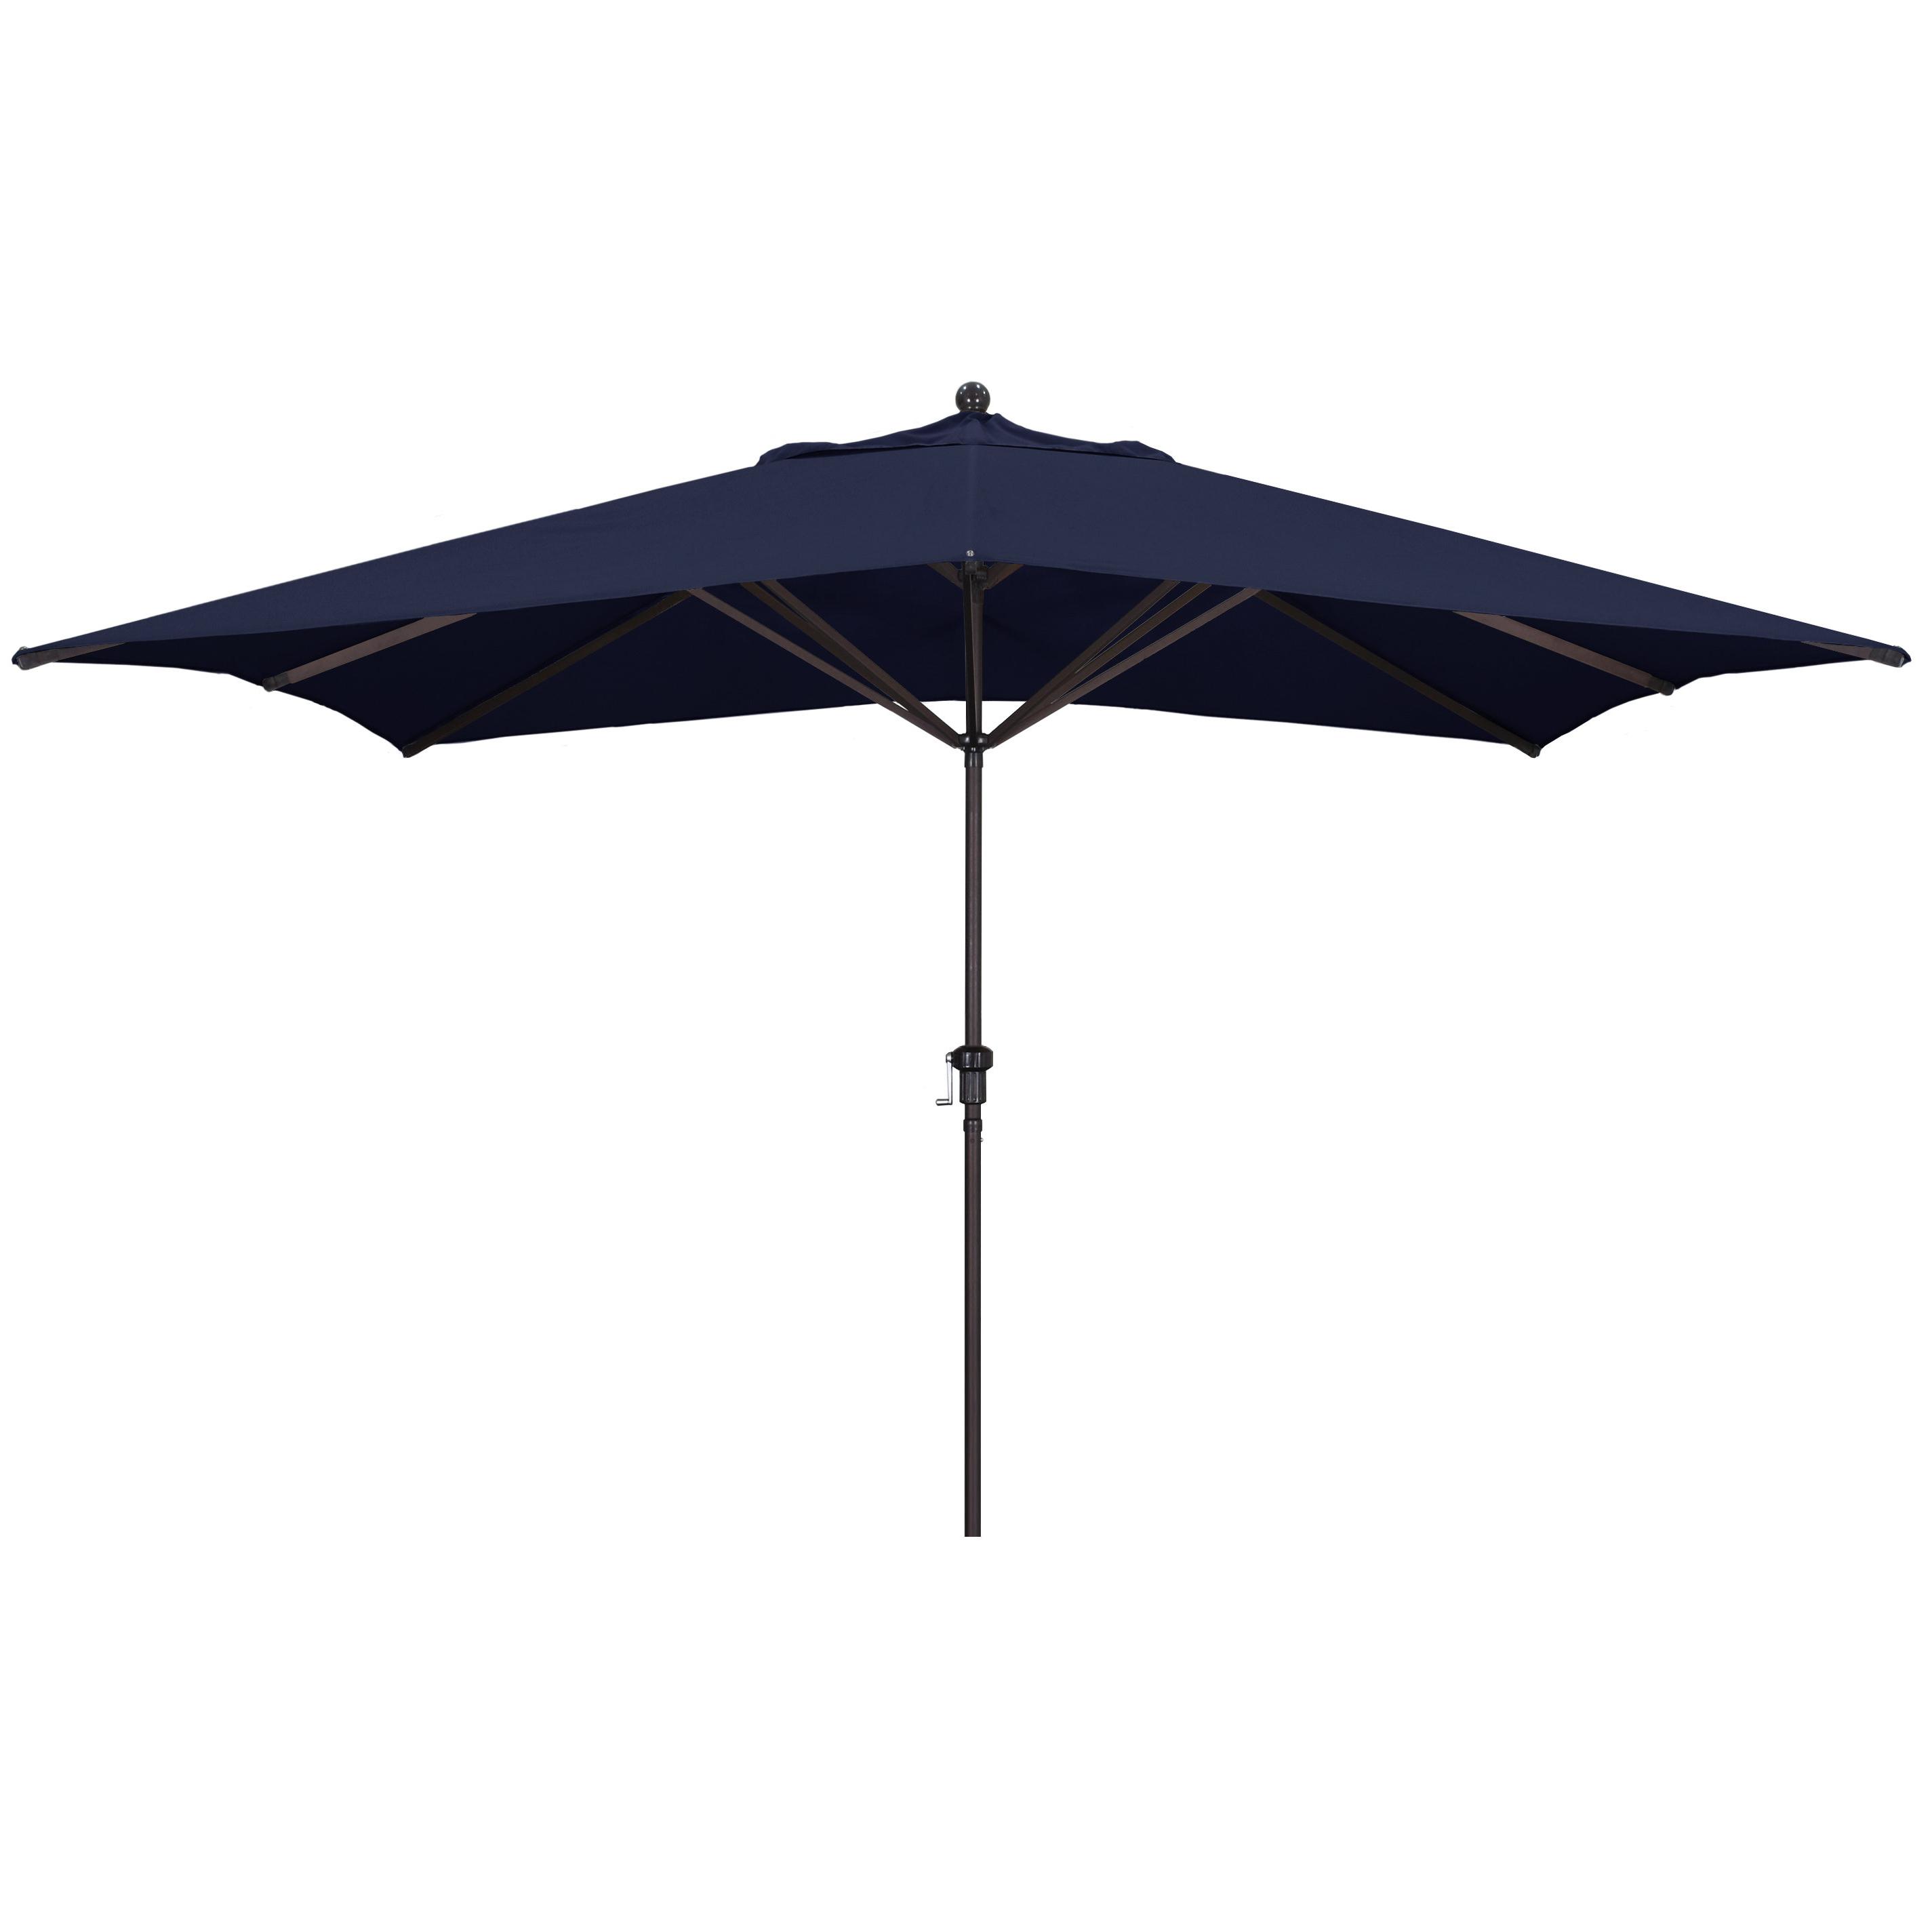 Jerrell Rectangular Market Umbrellas Intended For 2019 Carlton 11' X 8' Rectangular Market Umbrella (View 8 of 20)